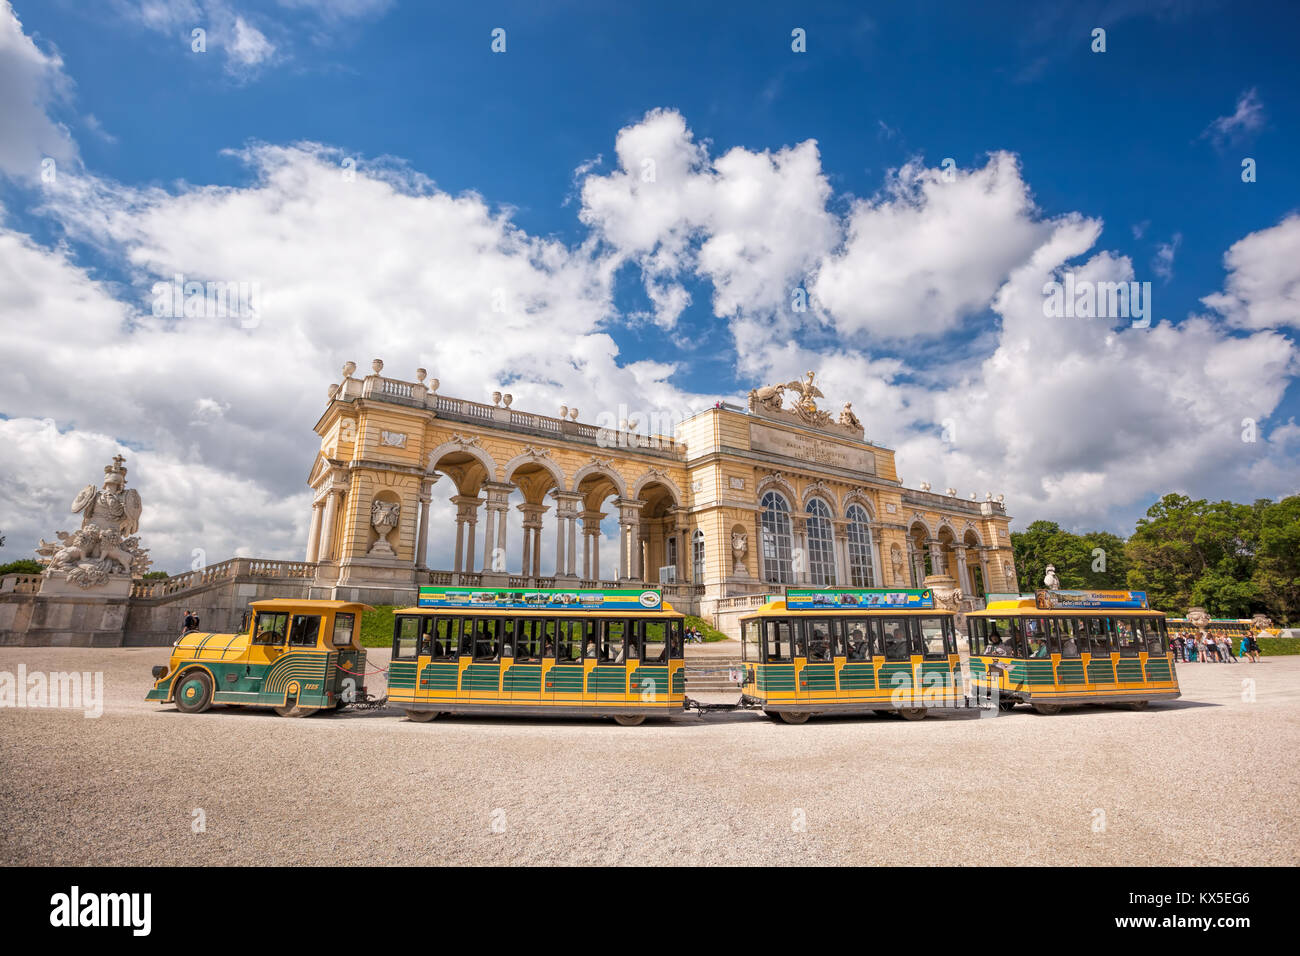 Famoso Gloriette en palacio Schonbrunn, Viena, Austria Imagen De Stock